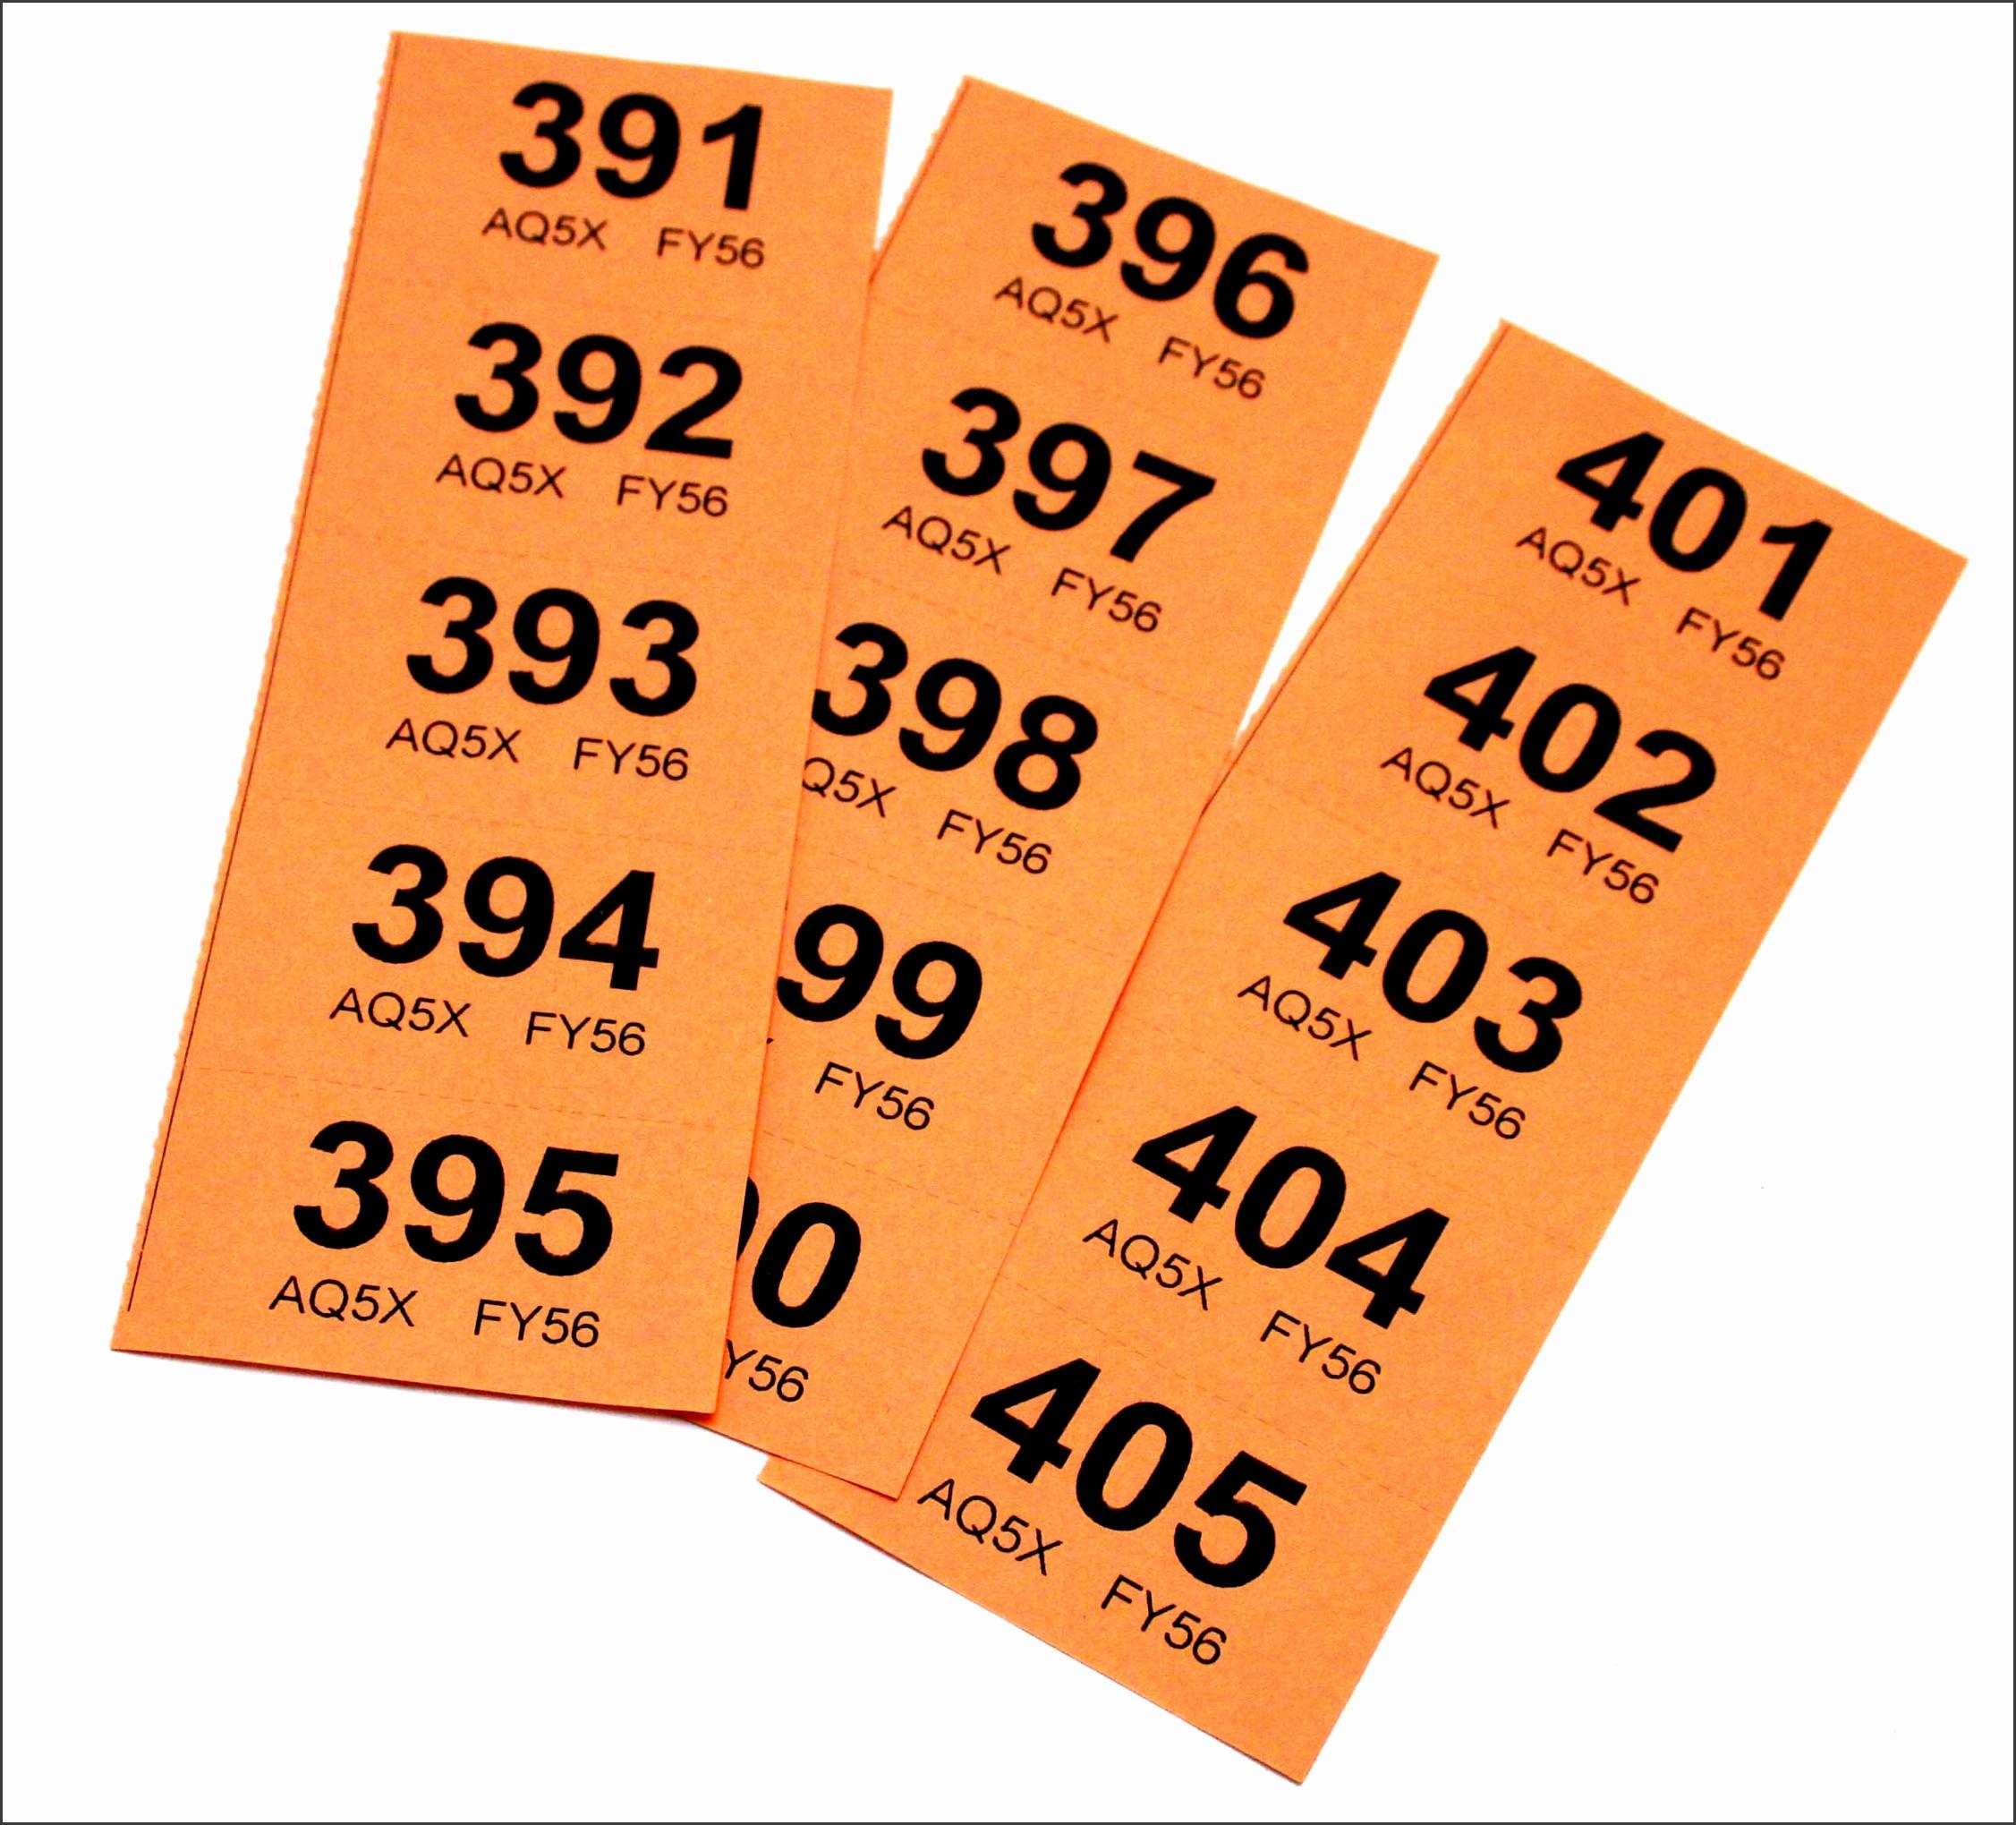 8 Raffle Ticket Draft SampleTemplatess SampleTemplatess